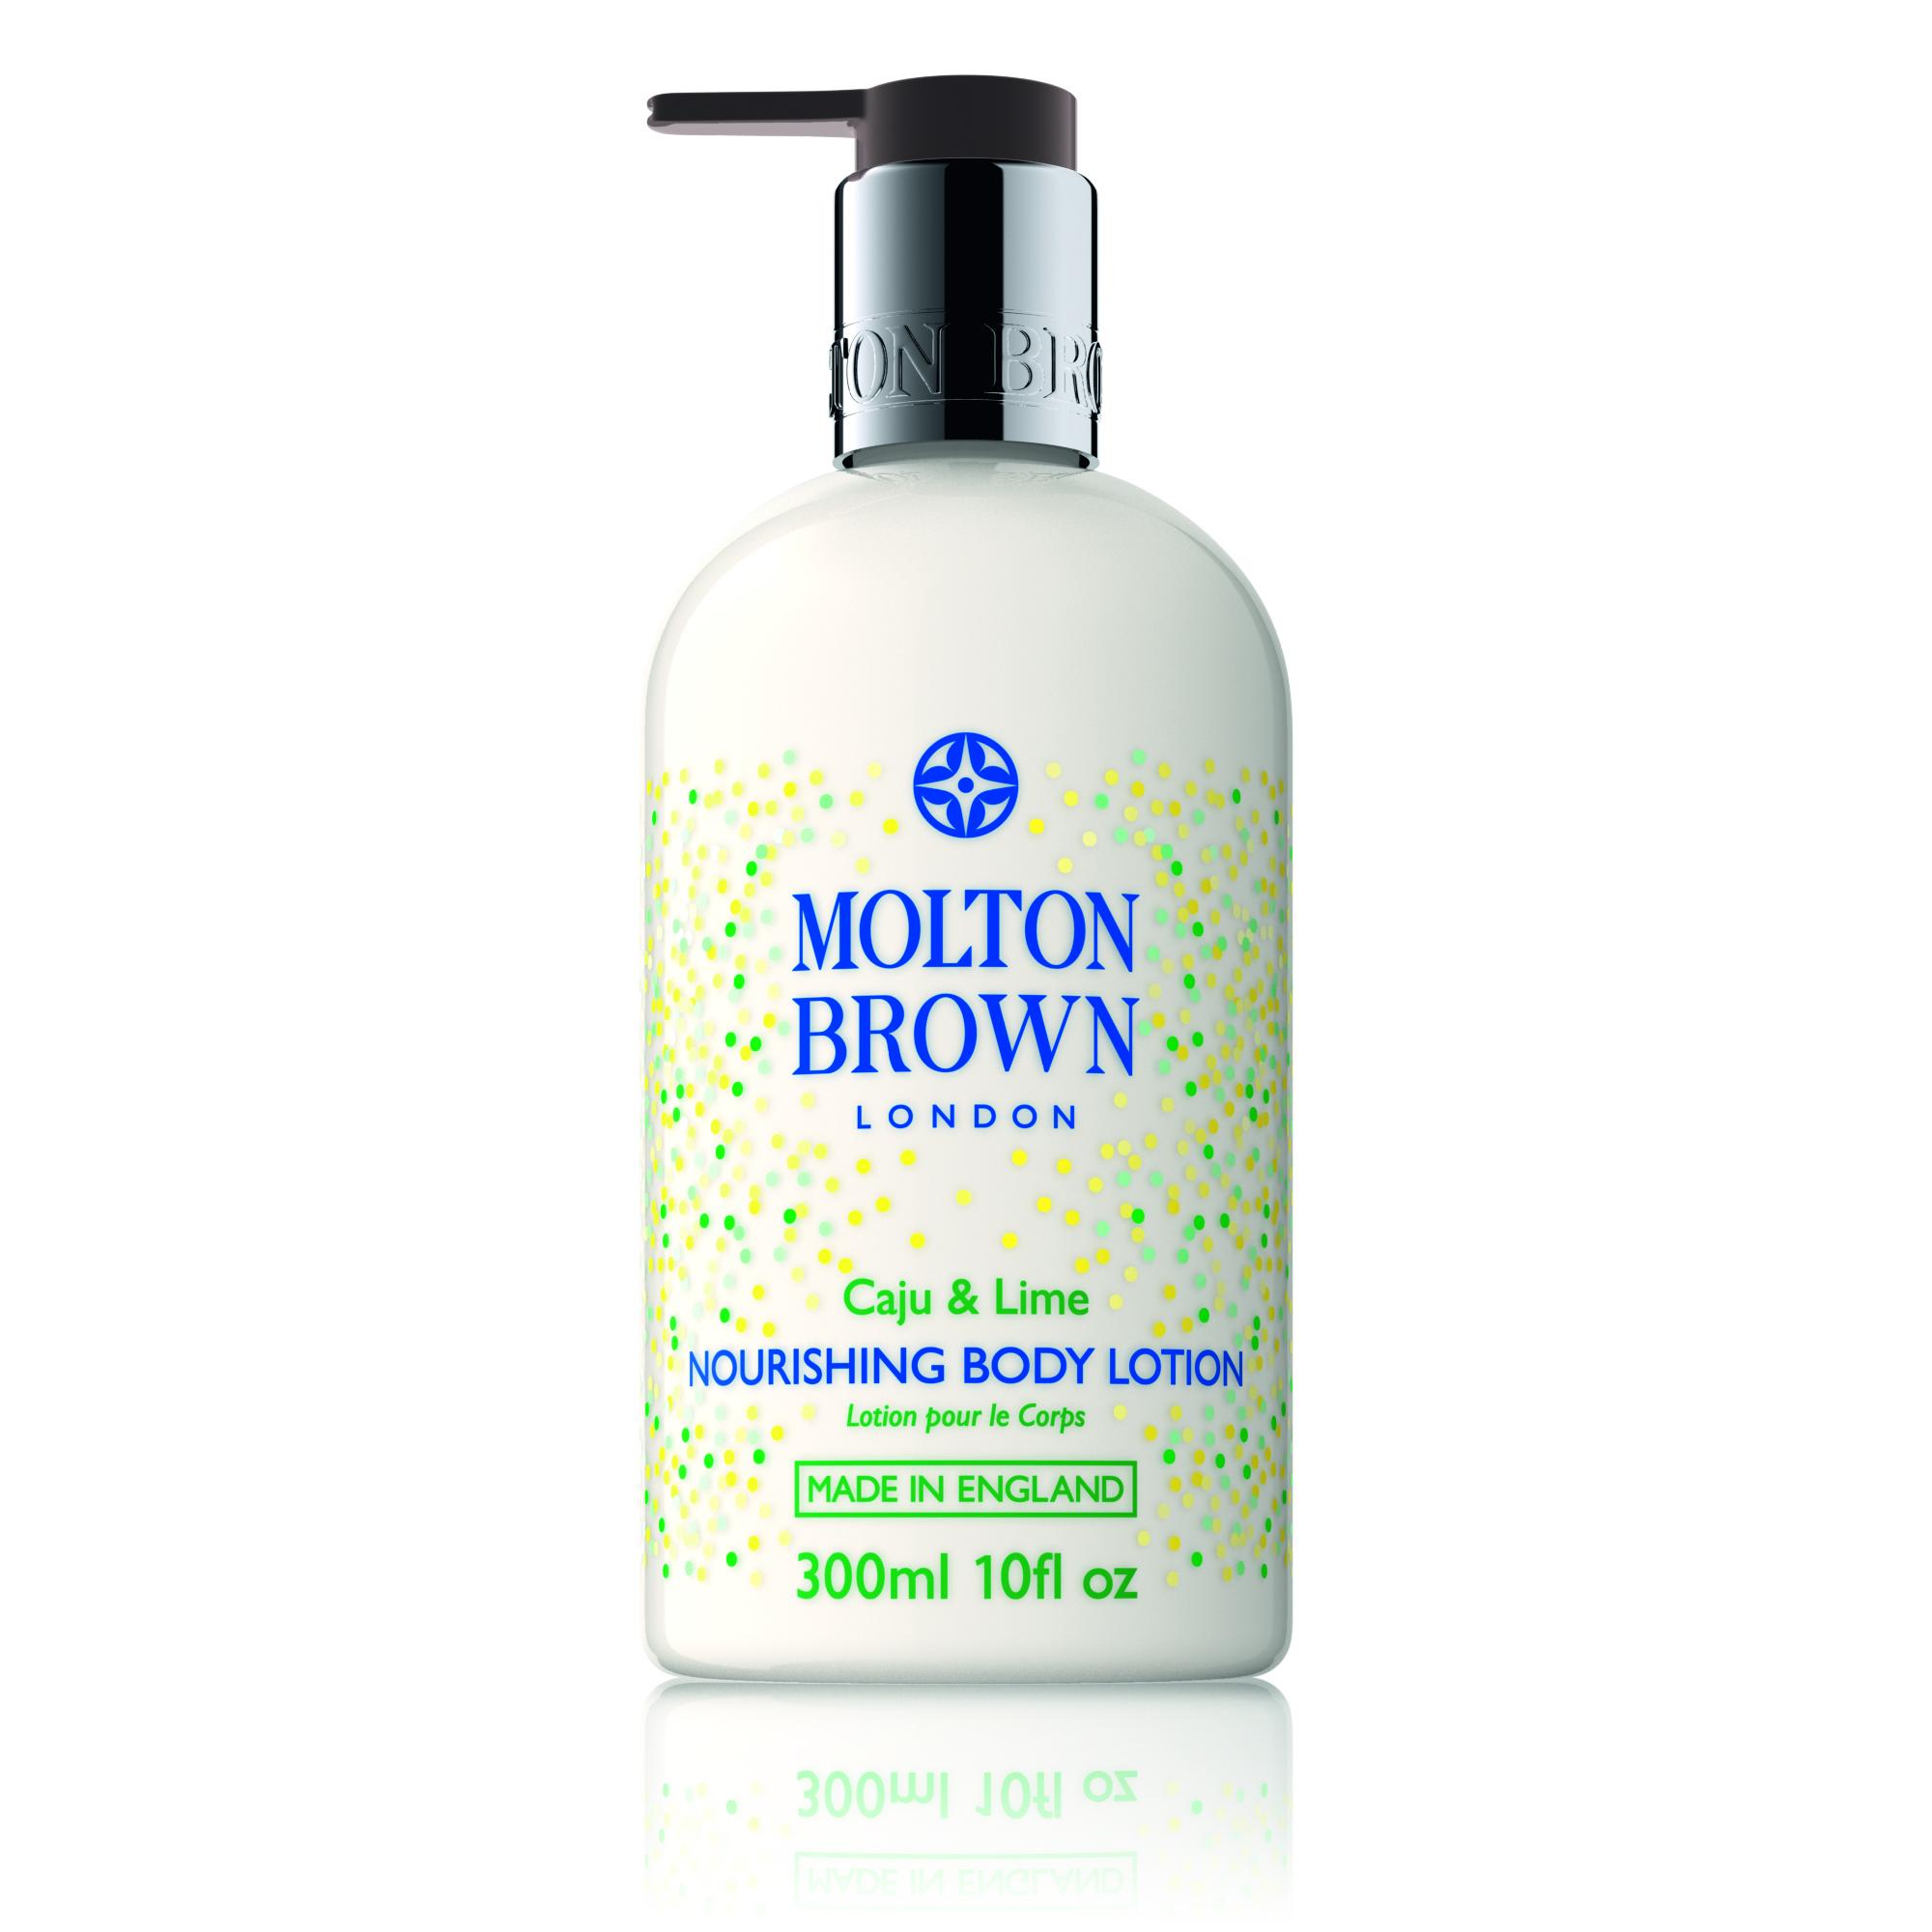 Wil jij deze Molton Brown Caju & Lime Set winnen?